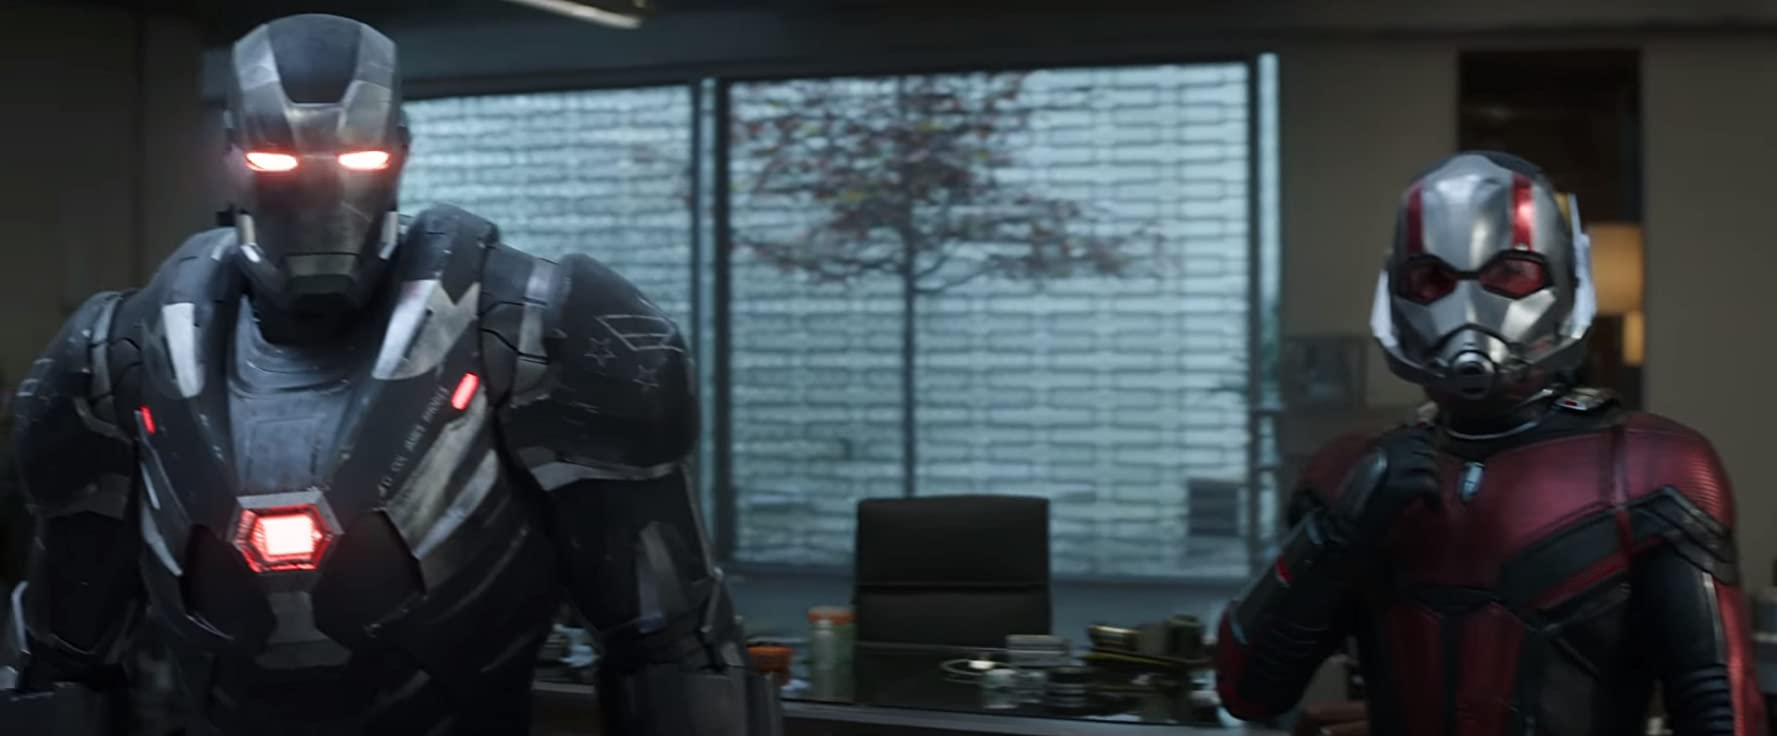 Don Cheadle and Paul Rudd in Avengers: Endgame (2019)